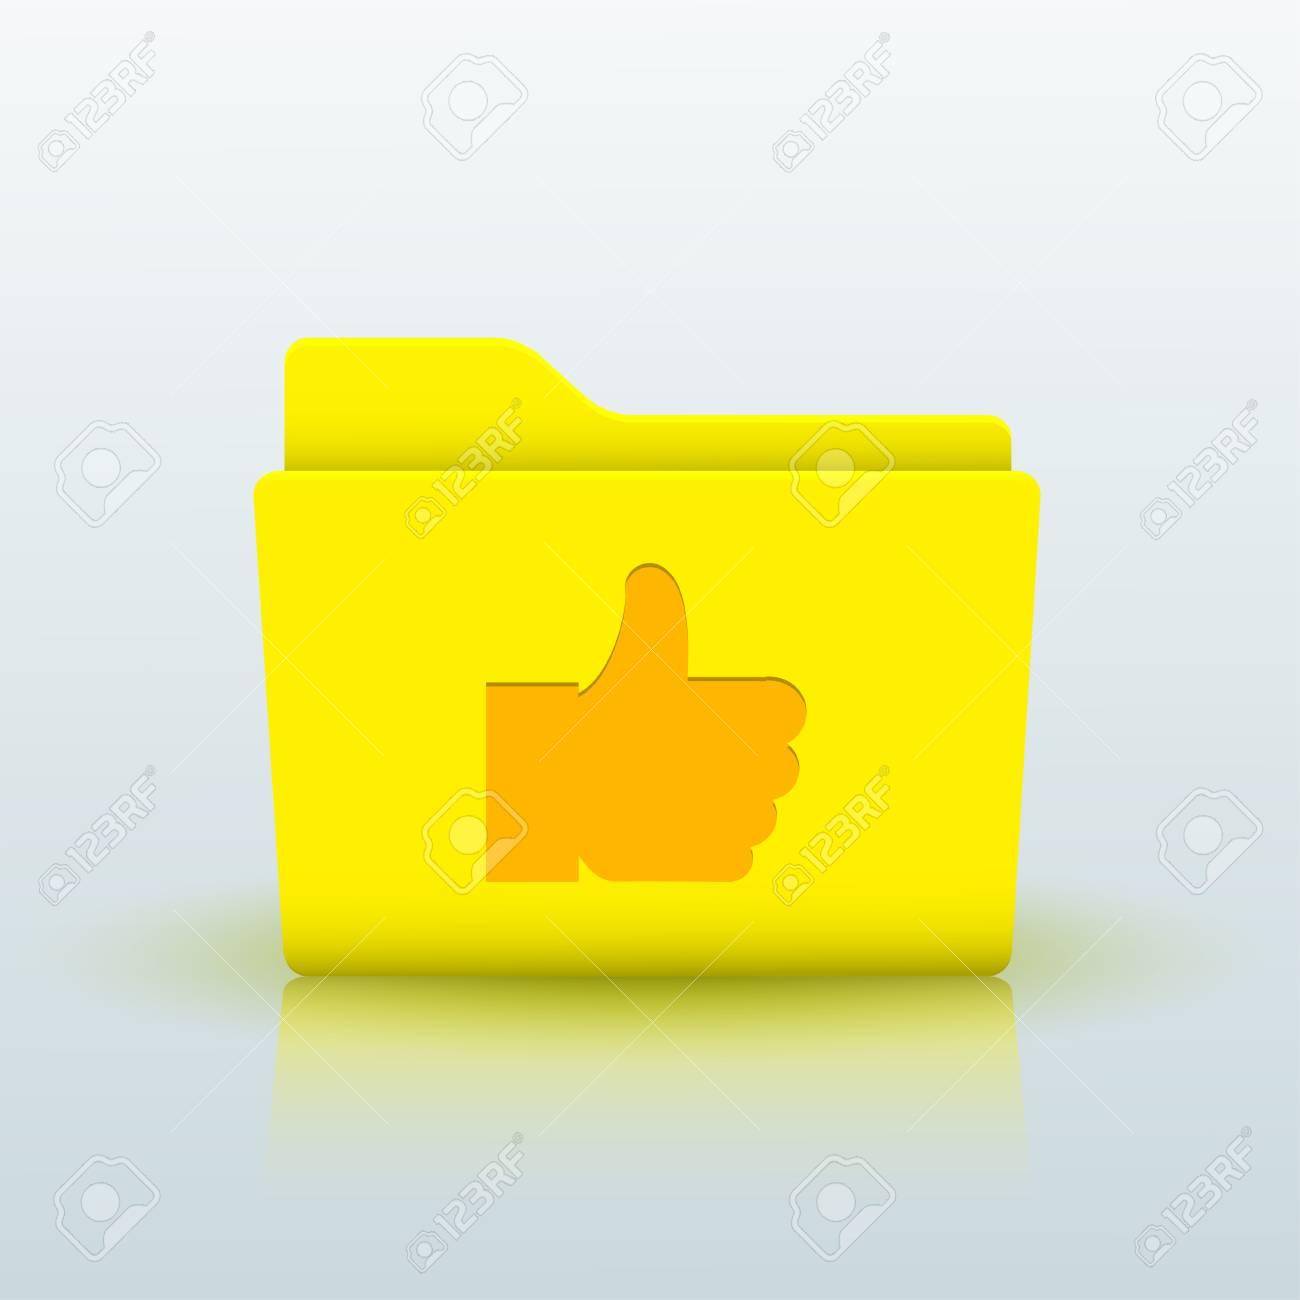 Vector yellow folder on blue background. Eps10 Stock Vector - 24809250